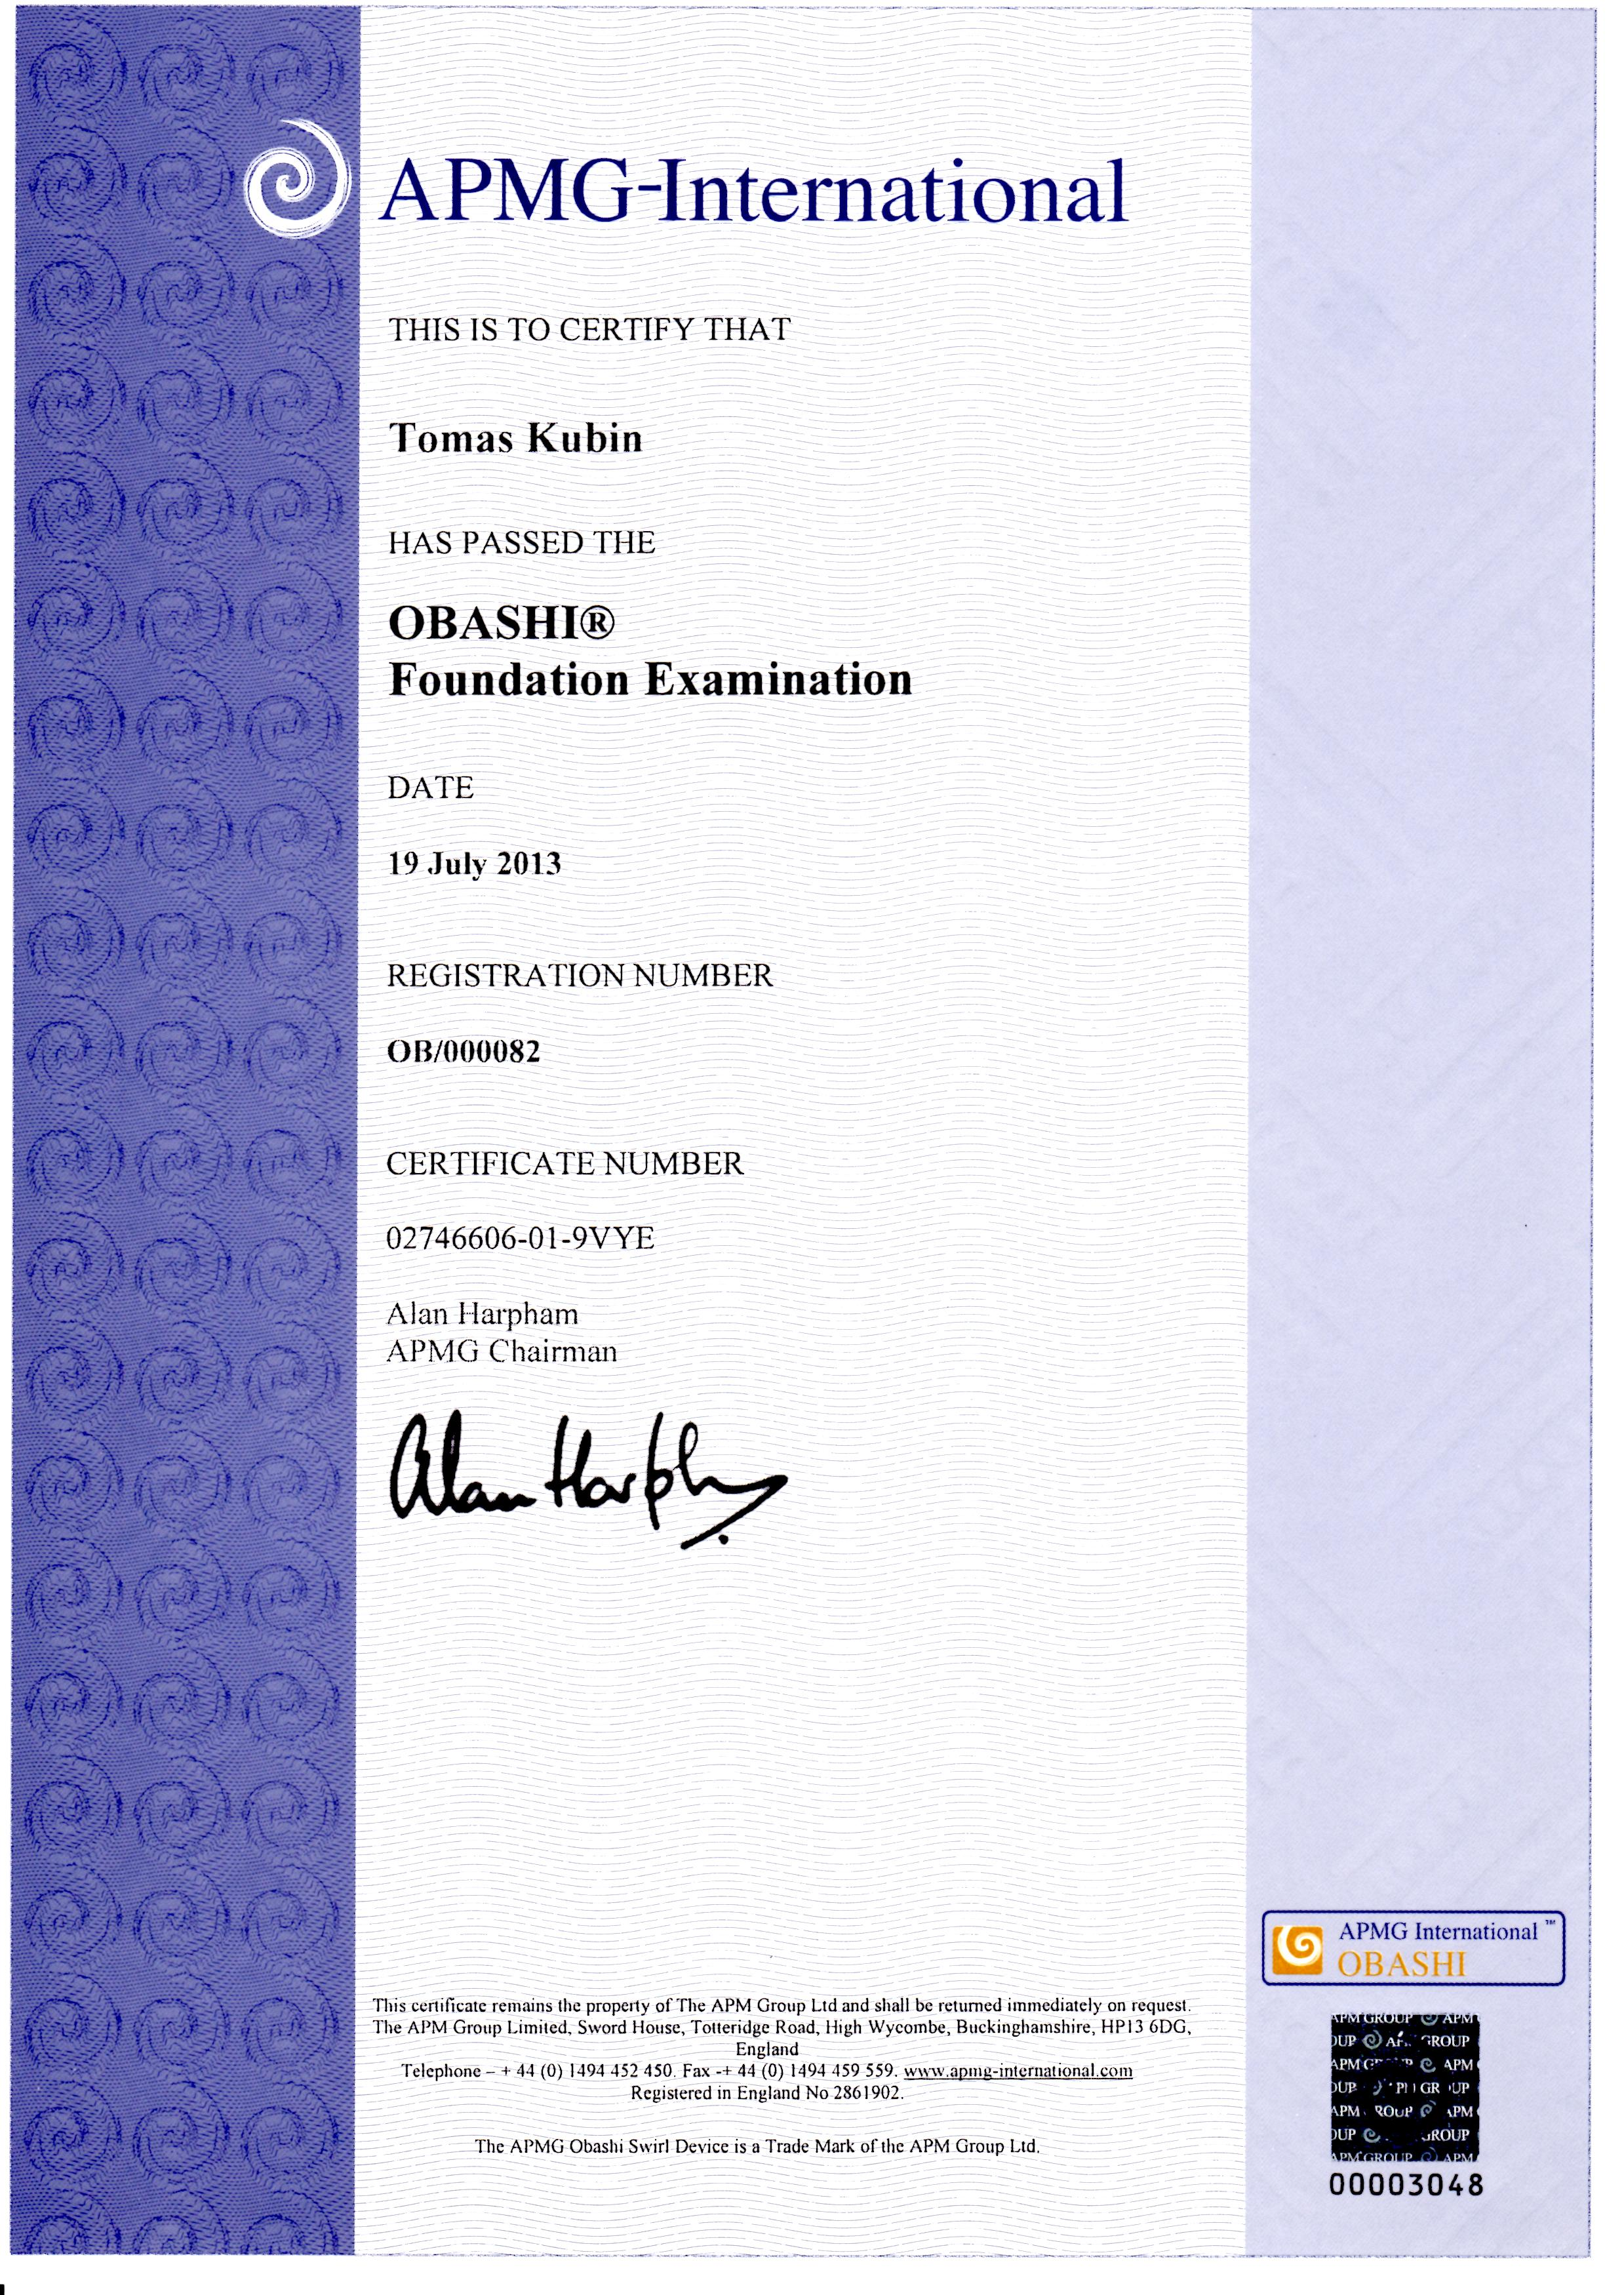 Tomas kubin personal website of tomas kubin itil service management apmg itil014970 xflitez Gallery